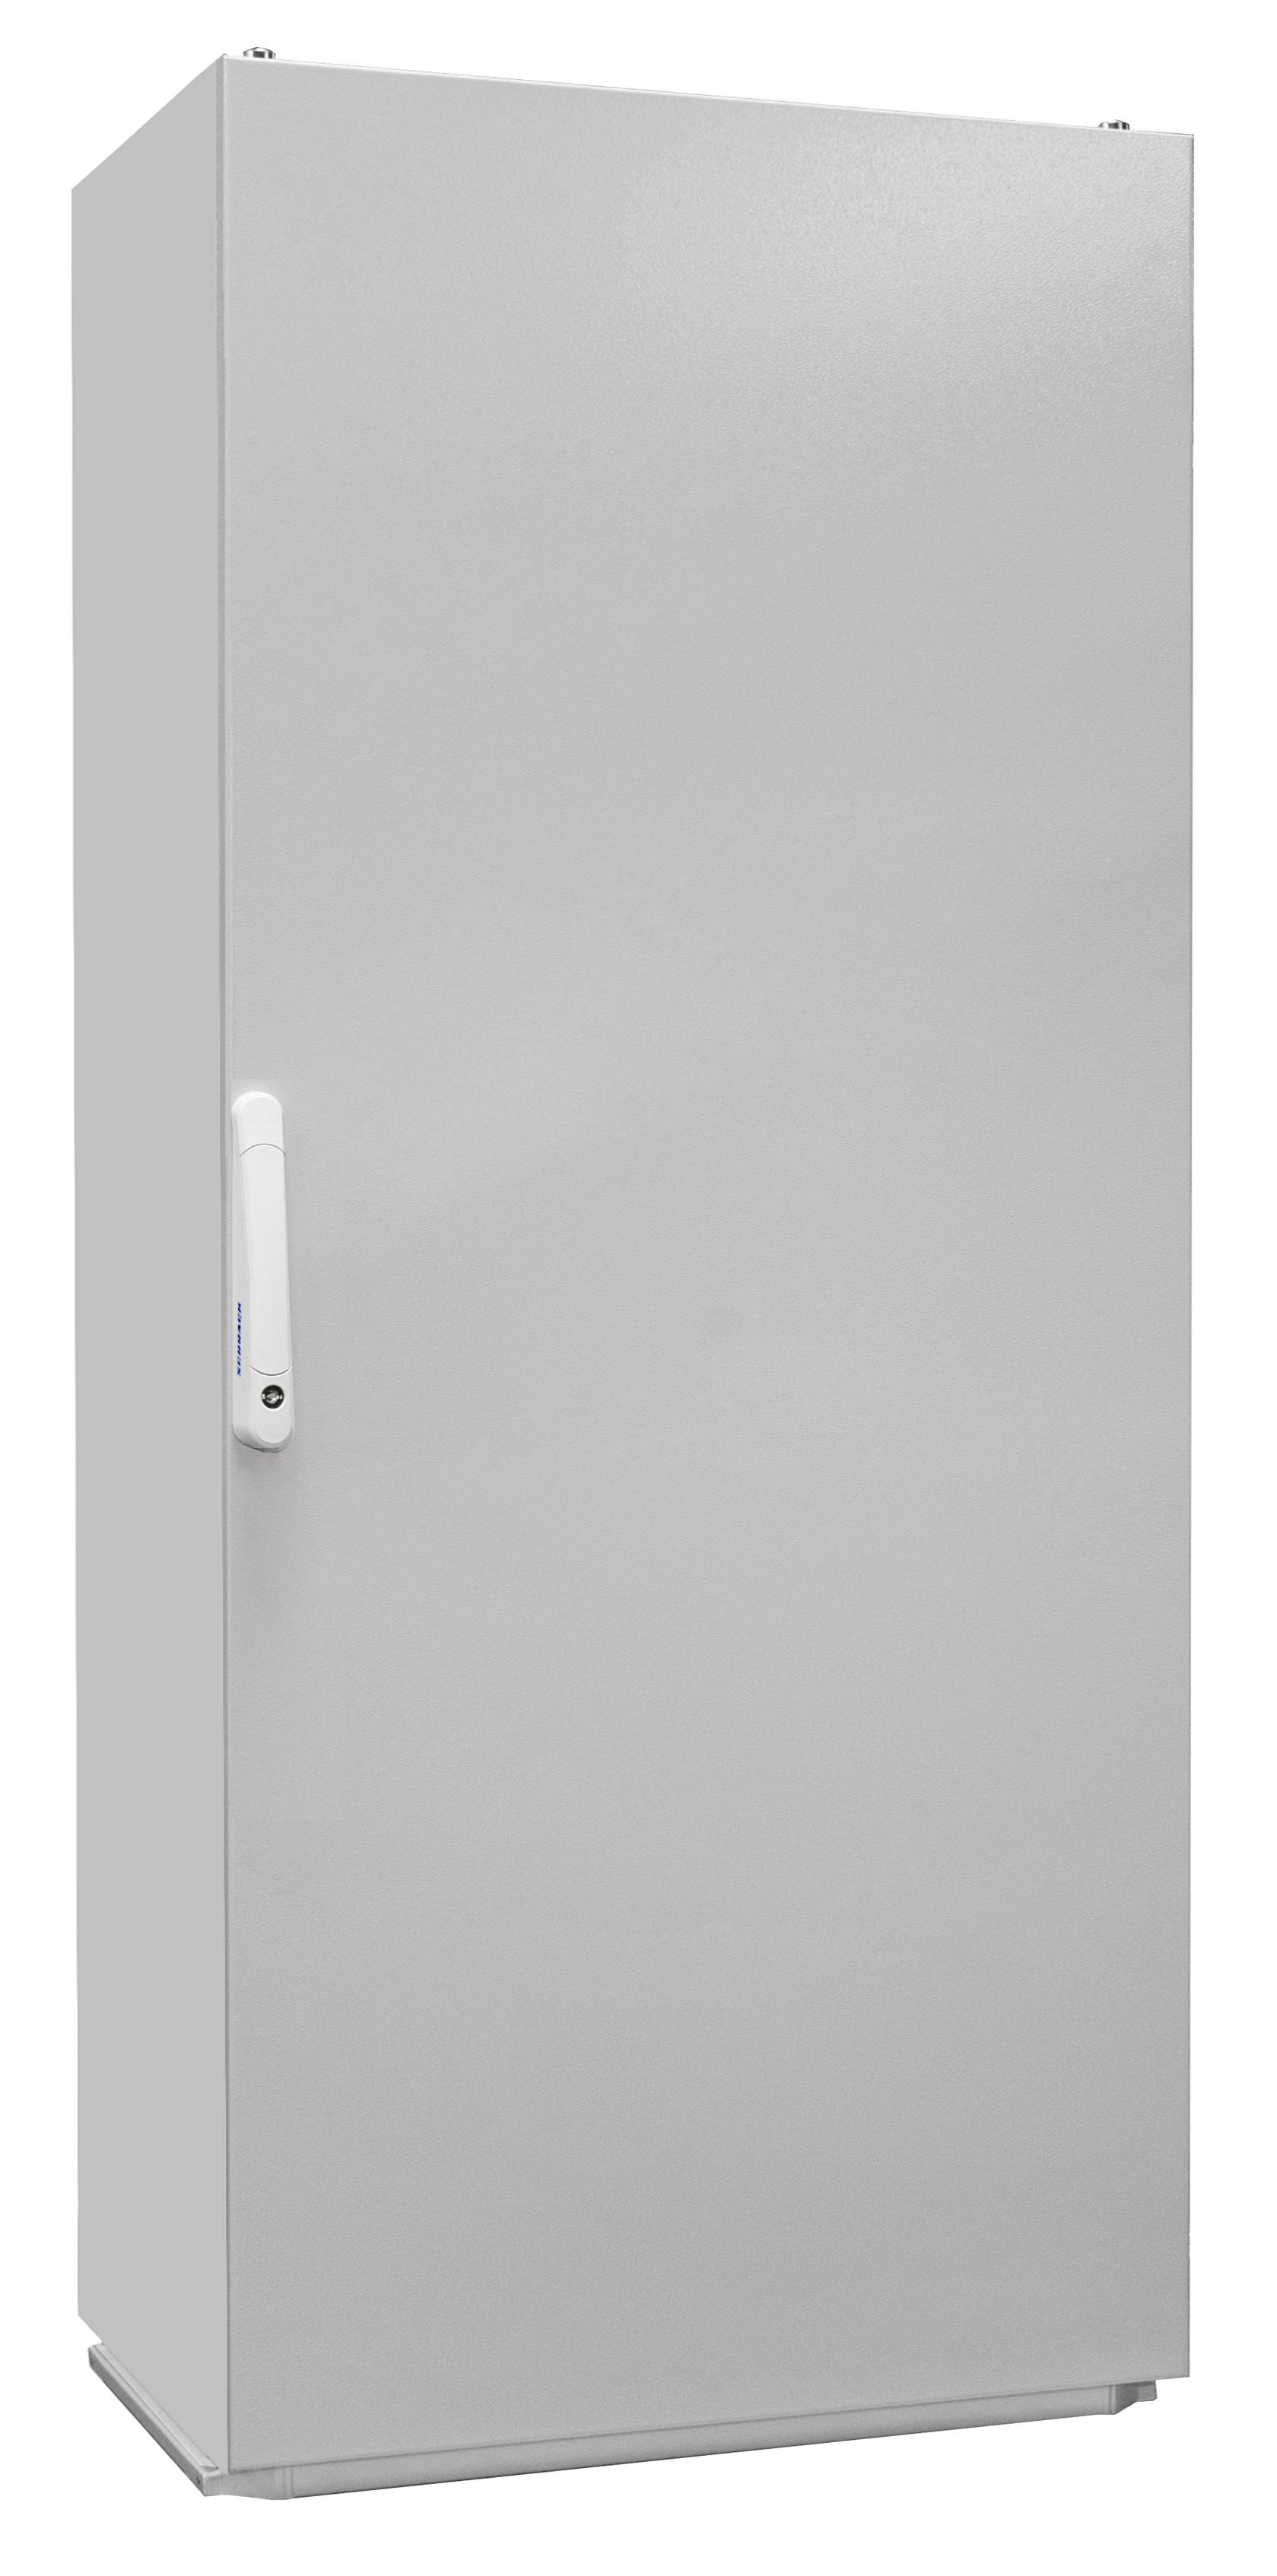 1 Stk Kompaktschrank 1-Tür IP55 H=1800 B=800 T=400mm Stahlblech KC188040--